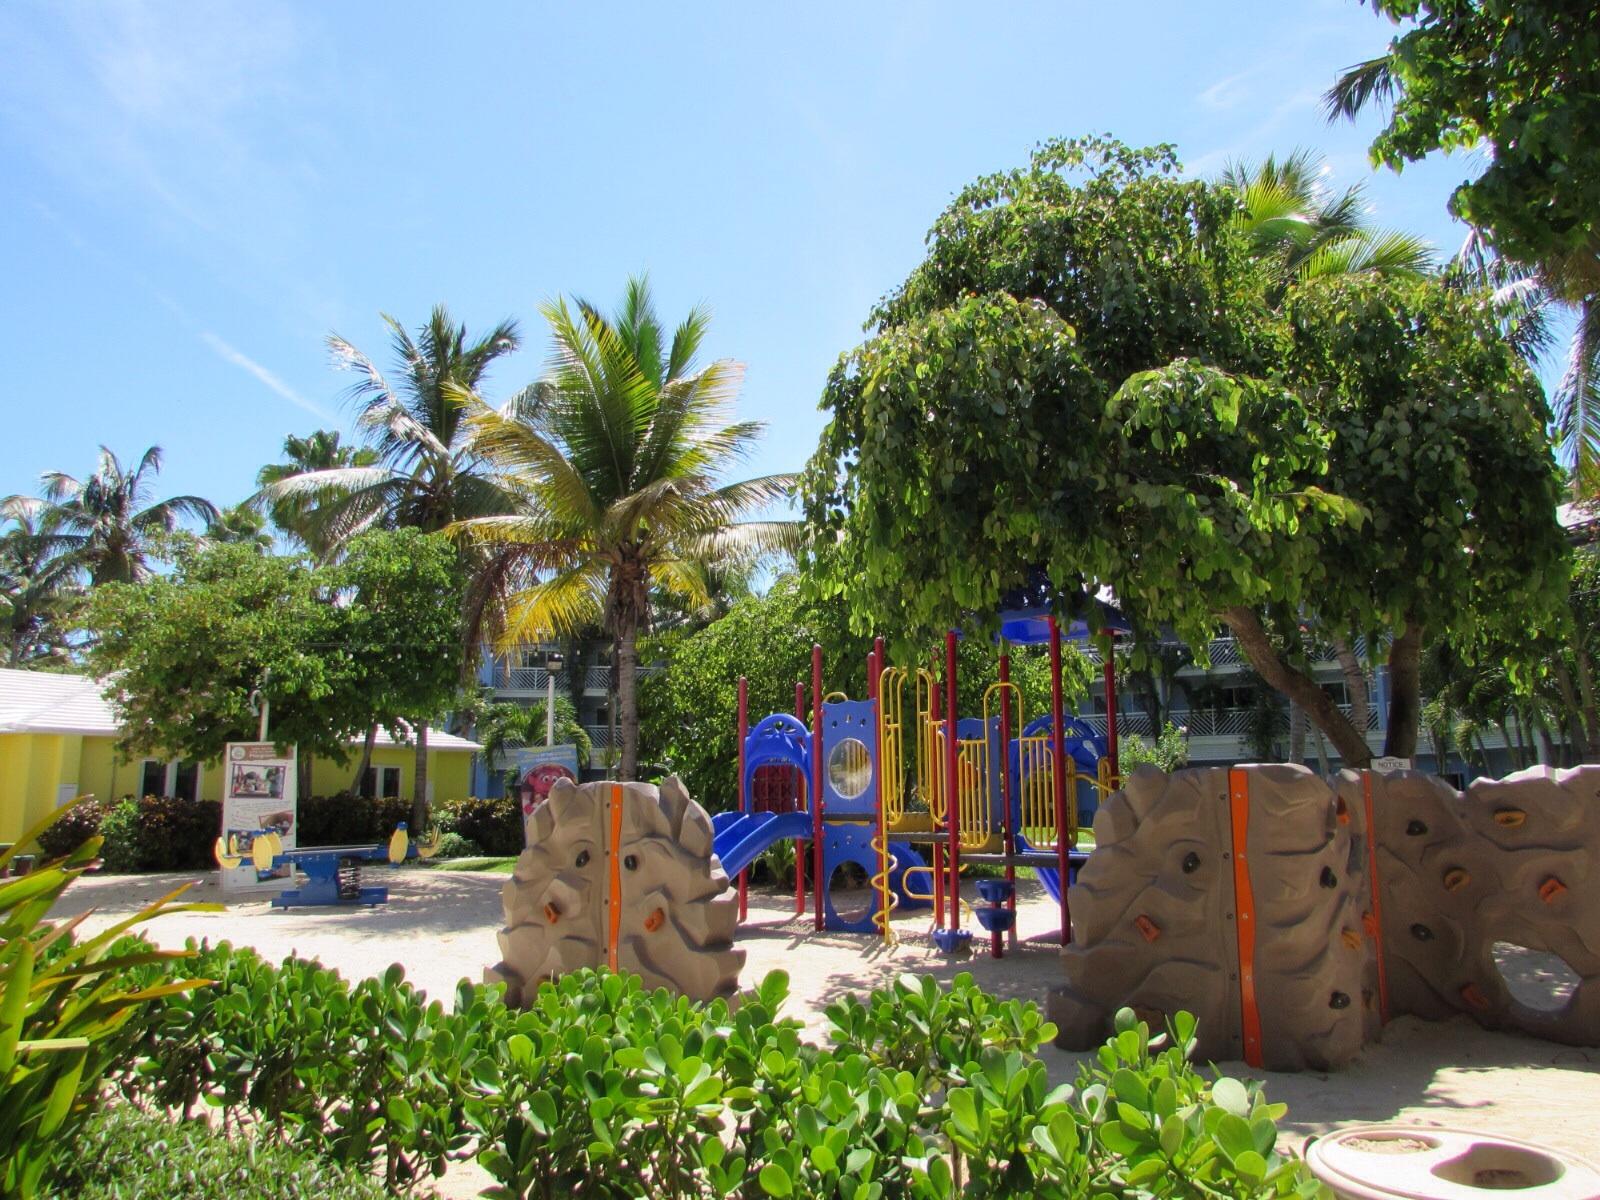 Beaches-Turks-and-Caicos-sparkleshinylove